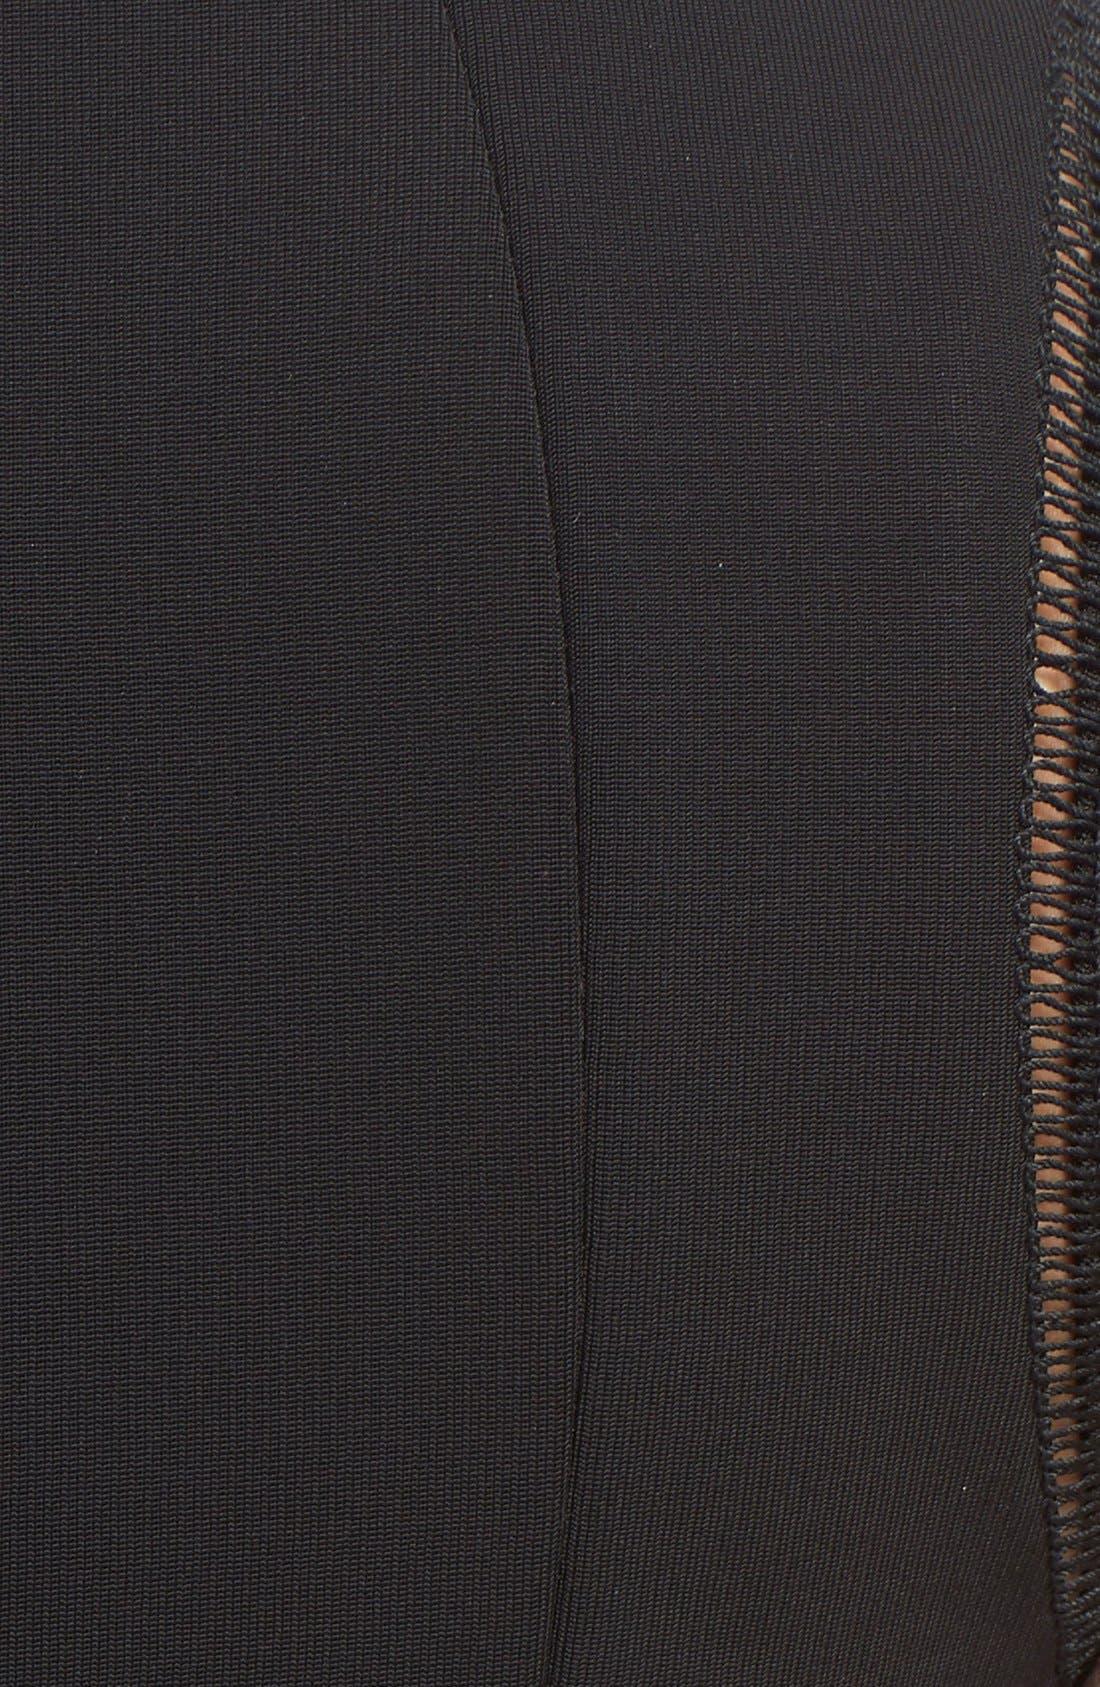 Alternate Image 3  - Victoria Beckham Rib Knit Fit & Flare Dress